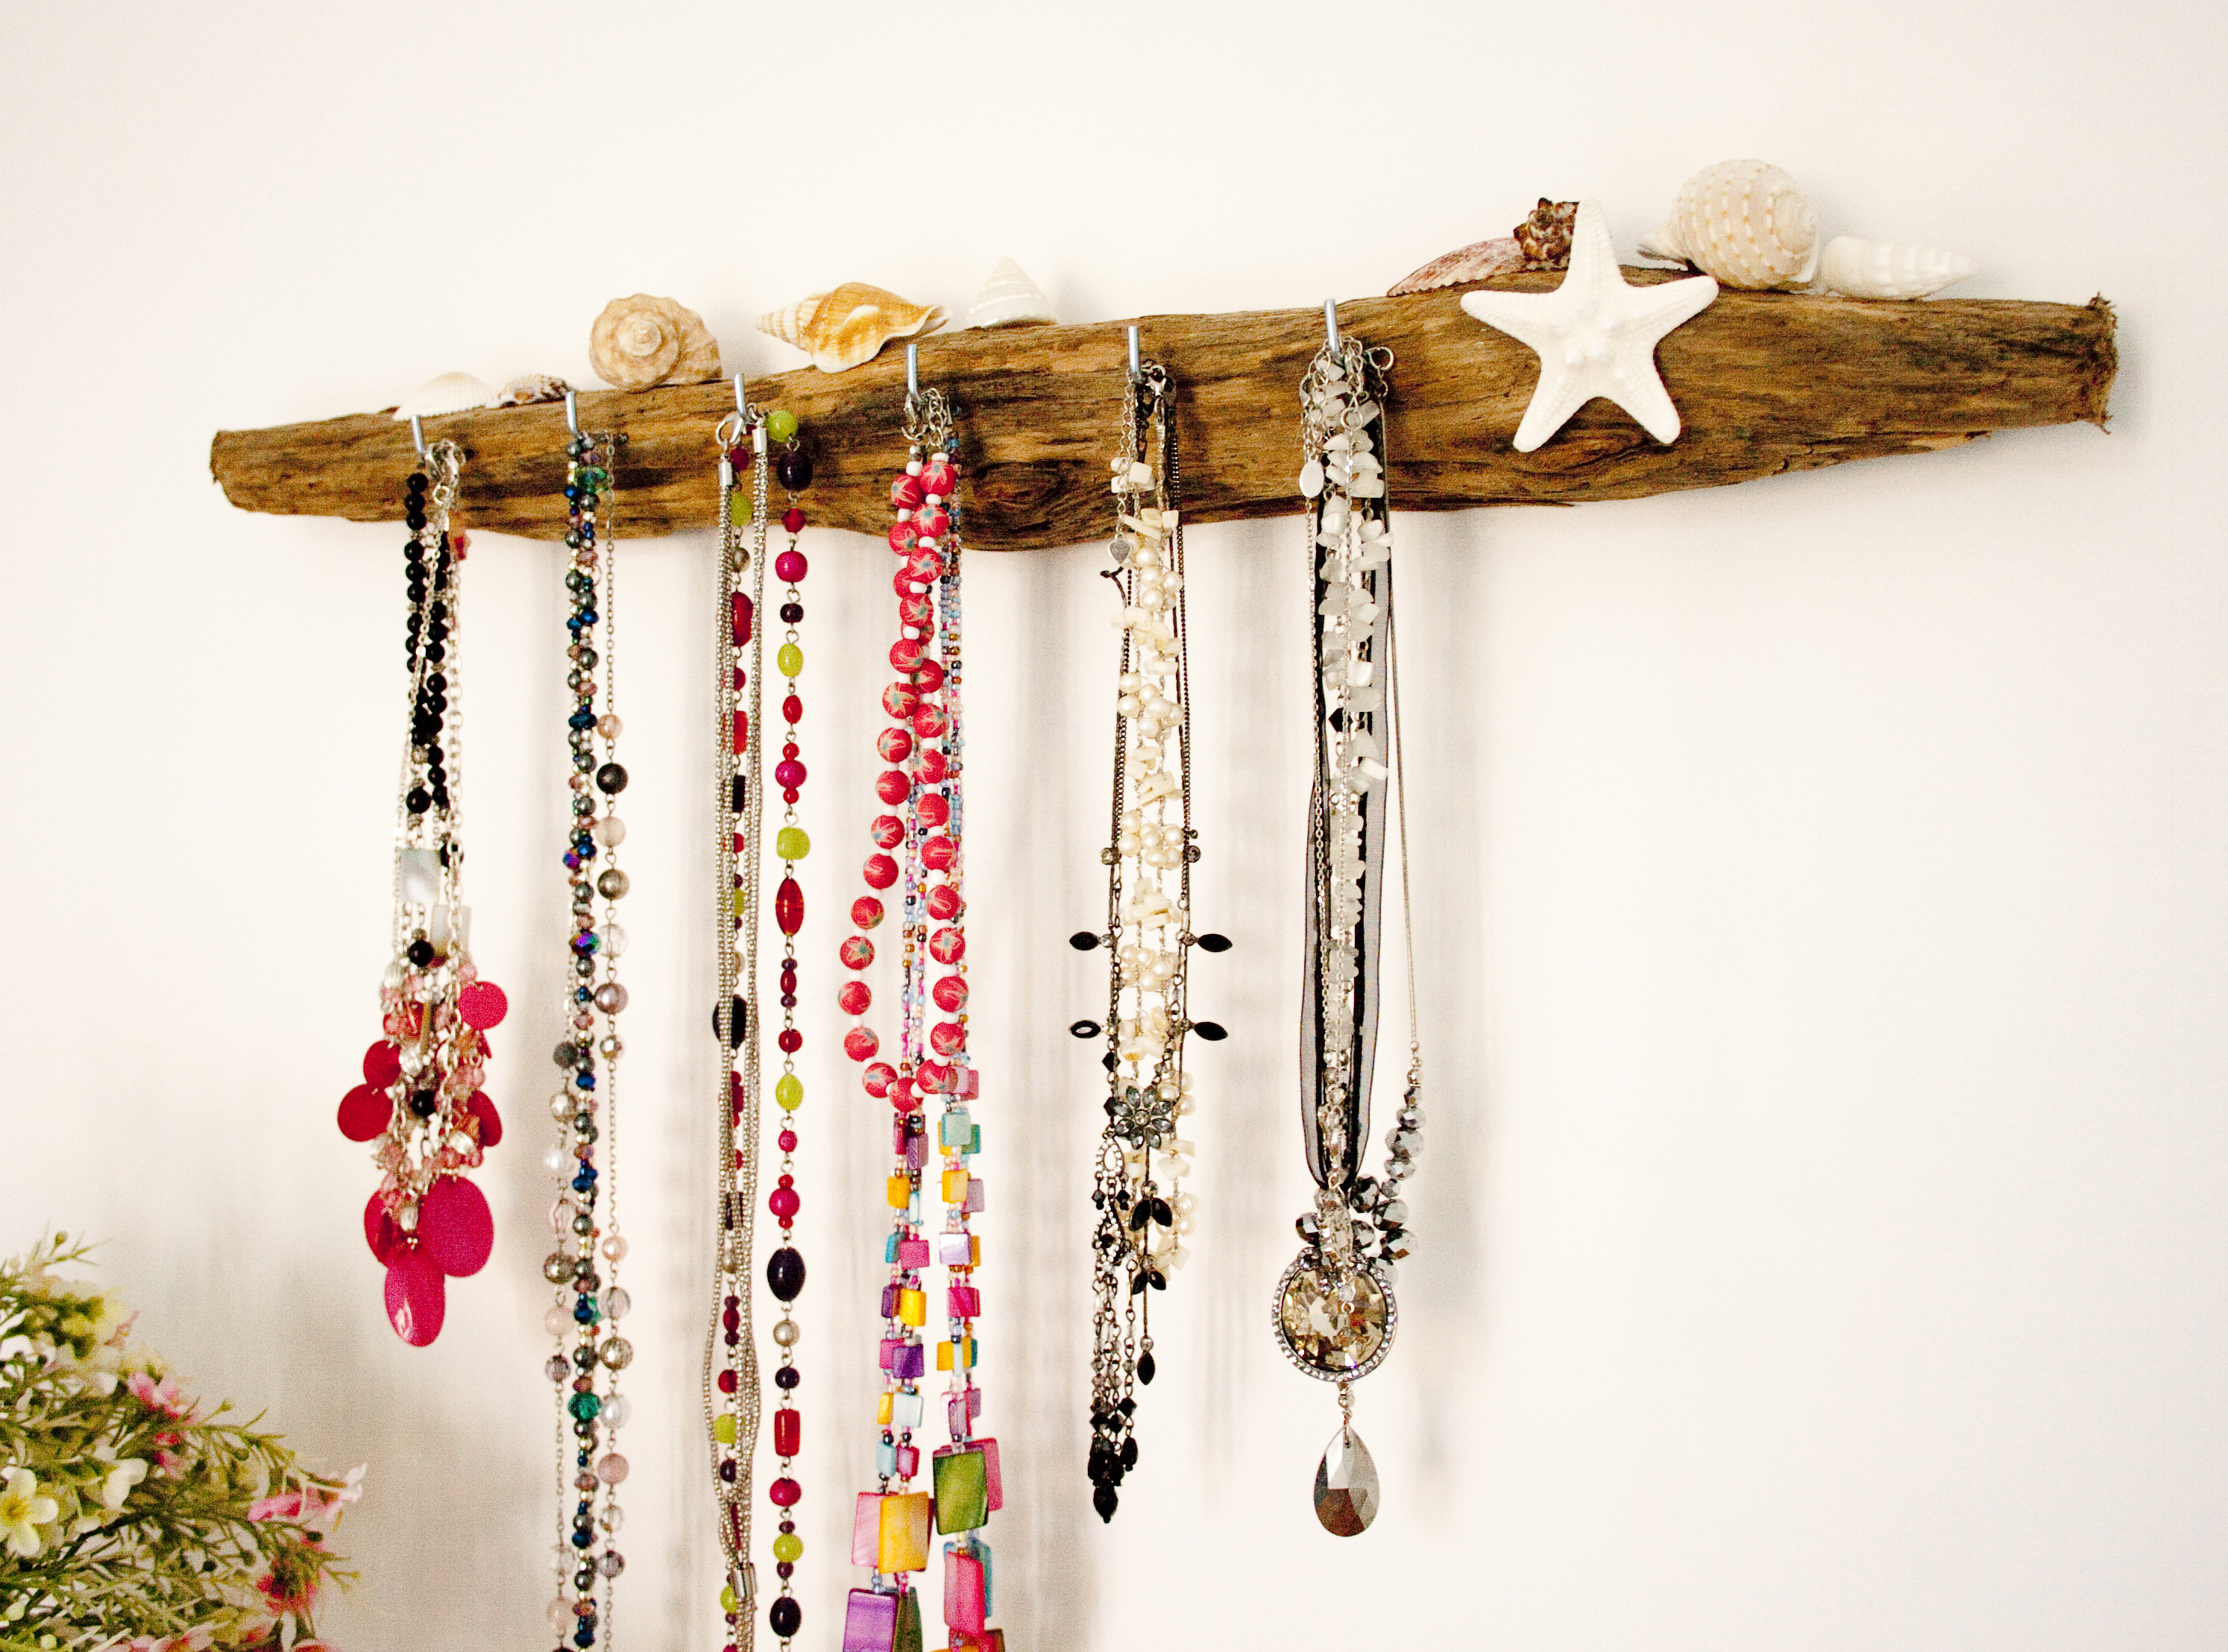 driftwood-jewellery-hanger-2.jpg